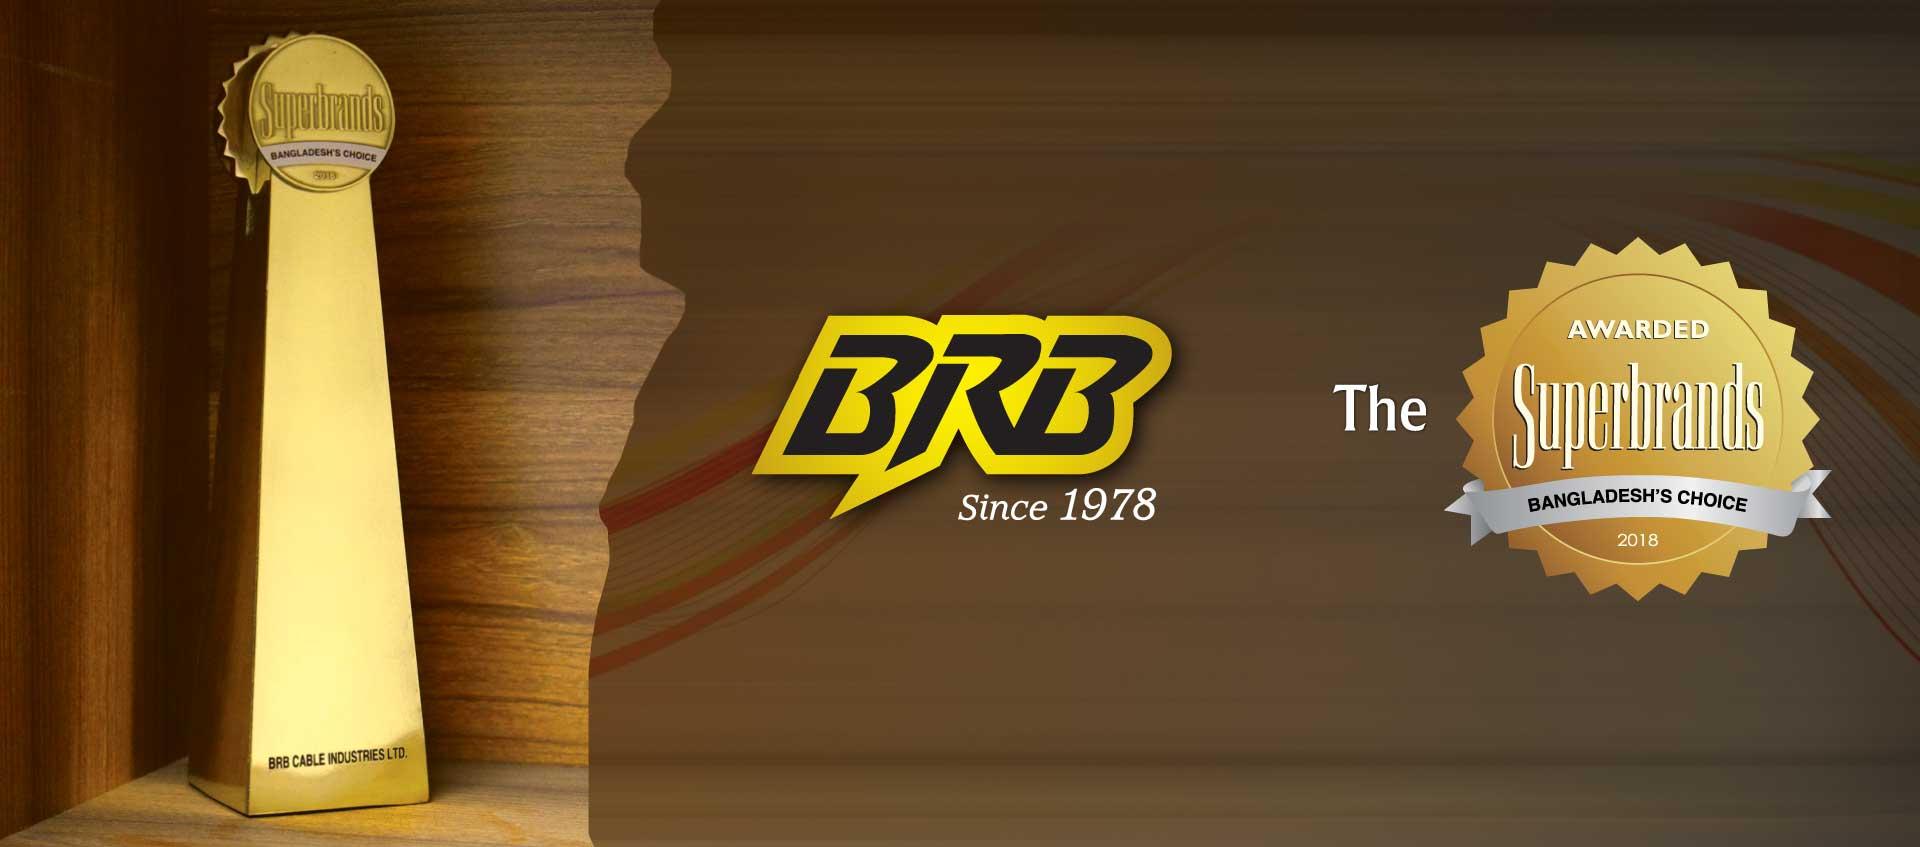 brb award